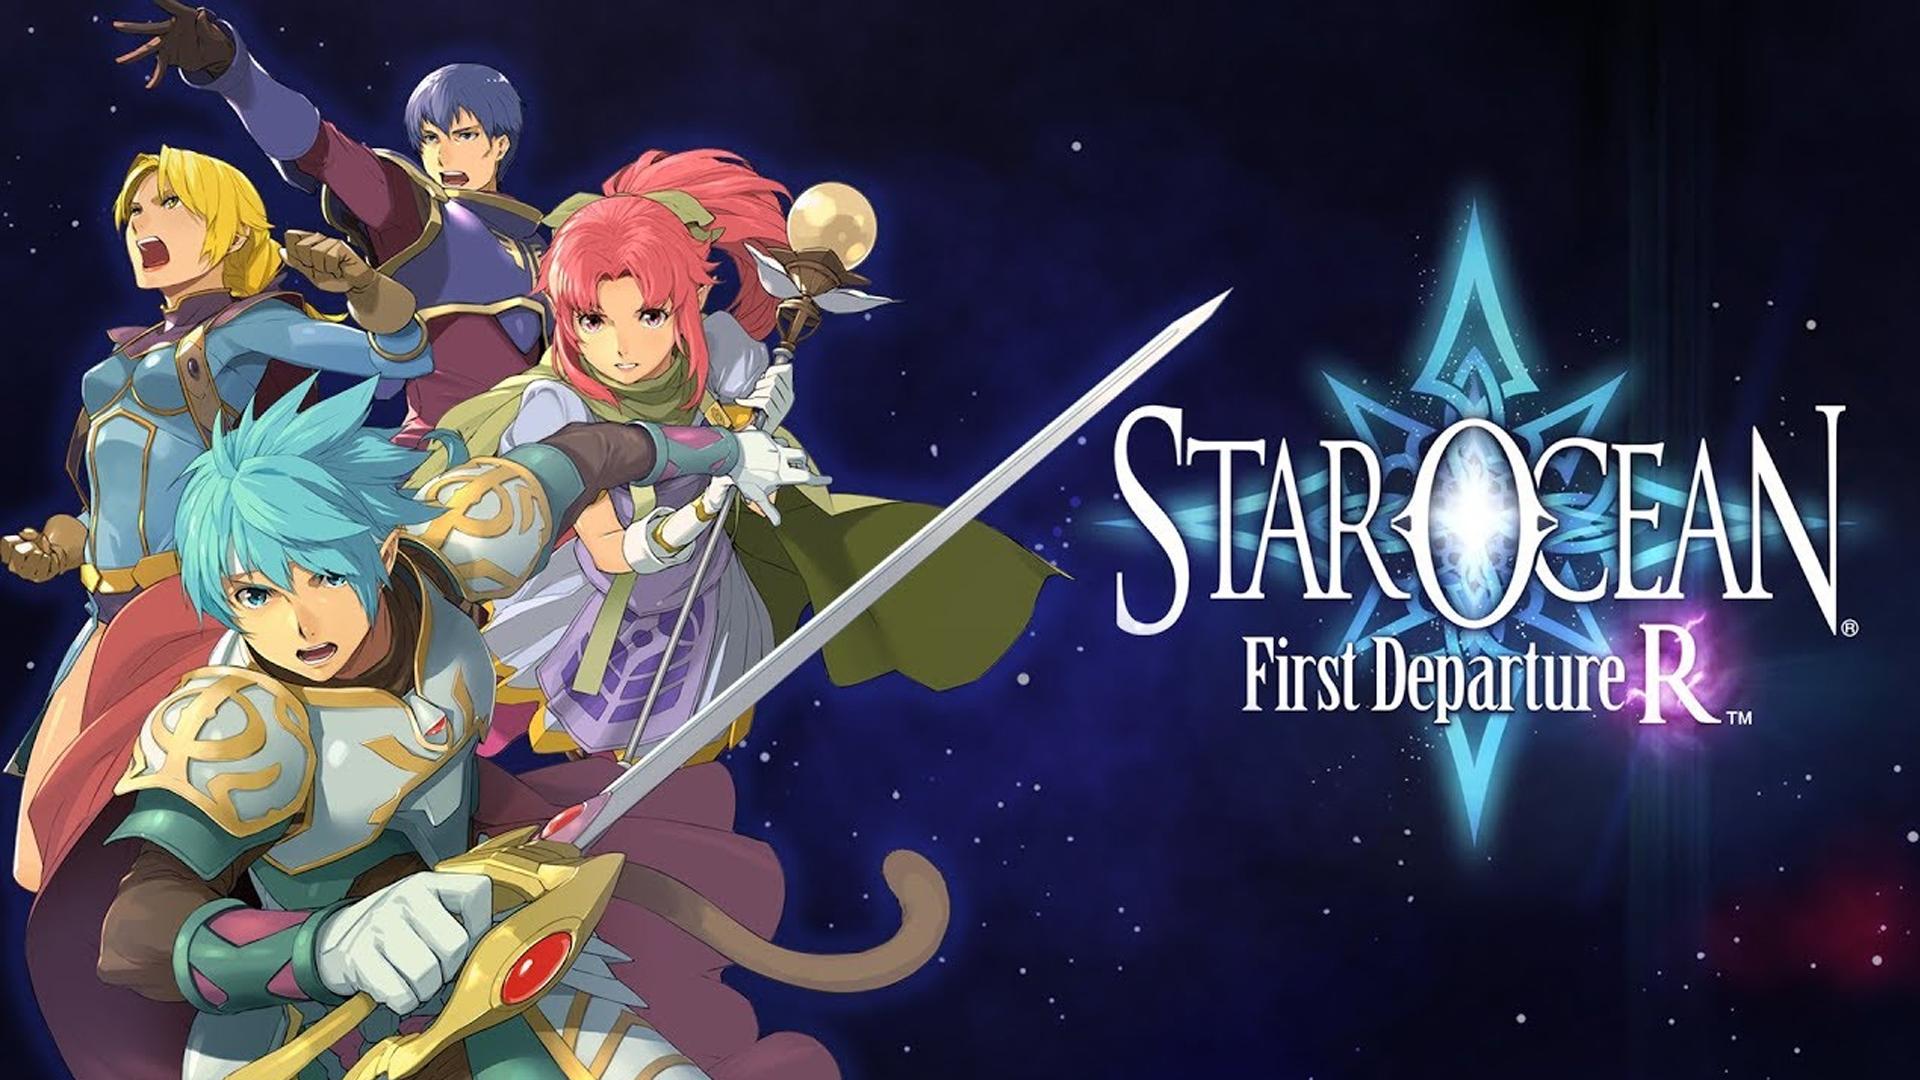 Star Ocean First Departure R Switch Review Switch Re Port Godisageek Com